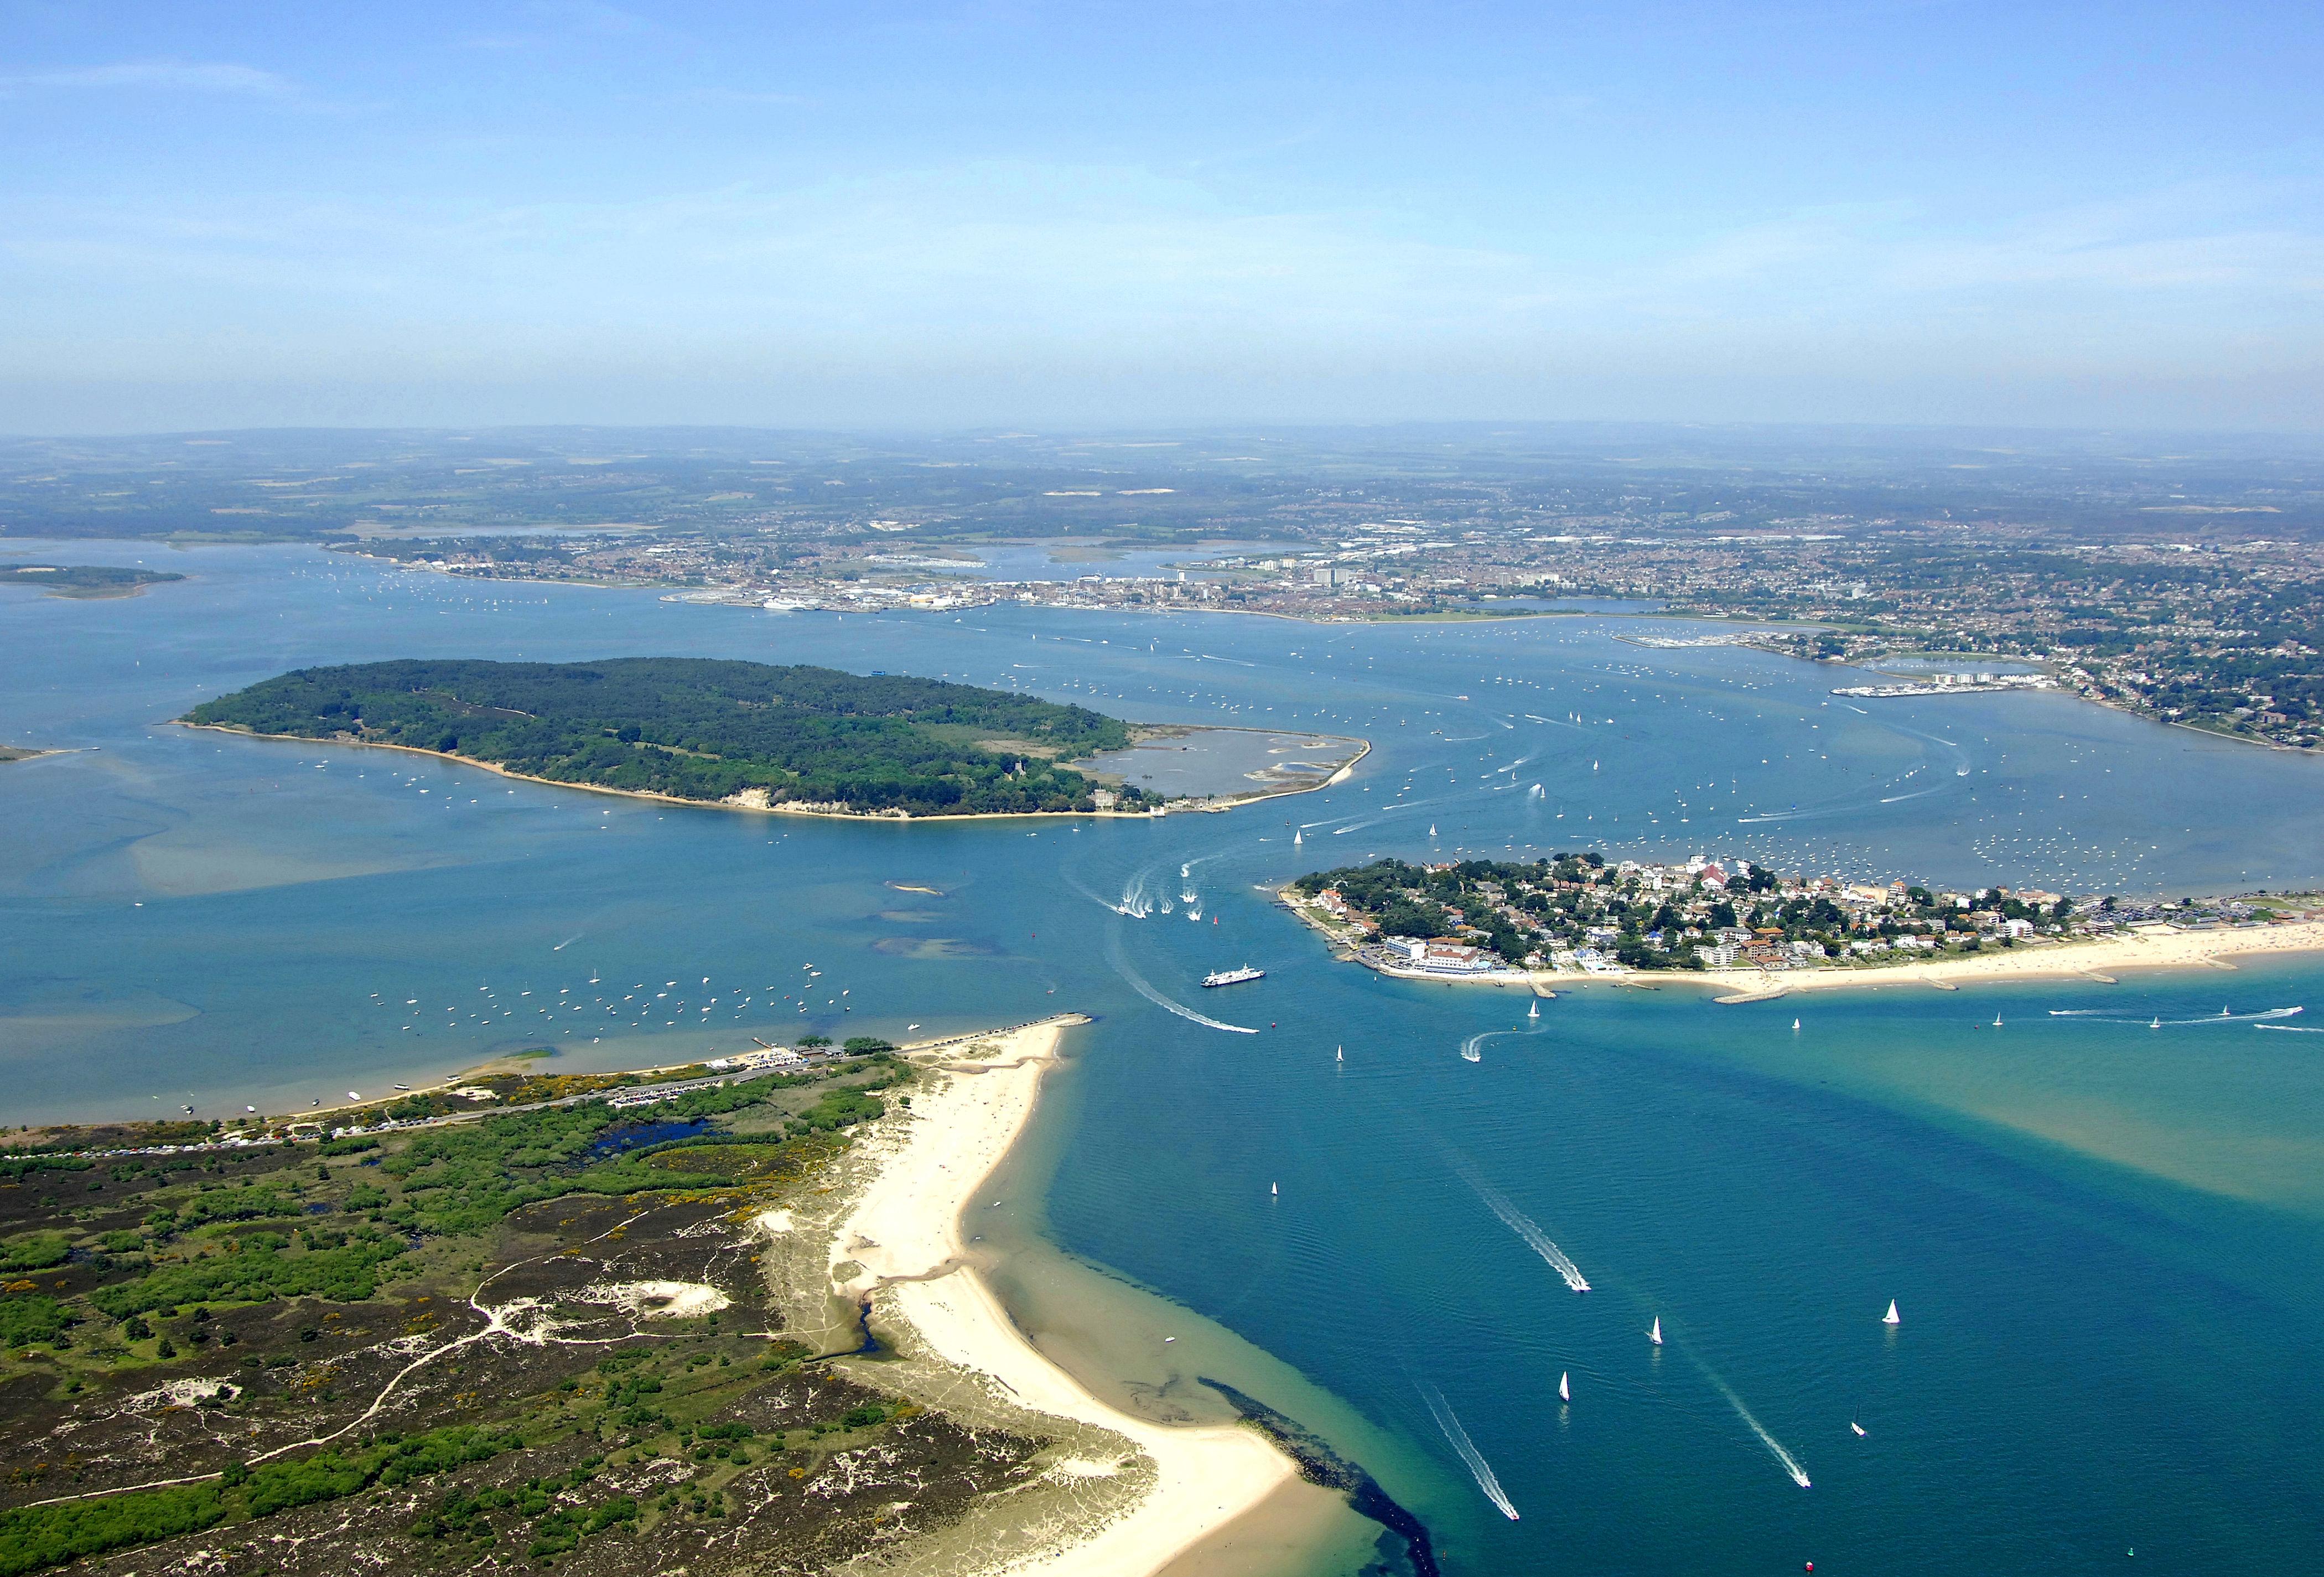 Poole Harbor in Poole, Dorset, GB, United Kingdom - harbor